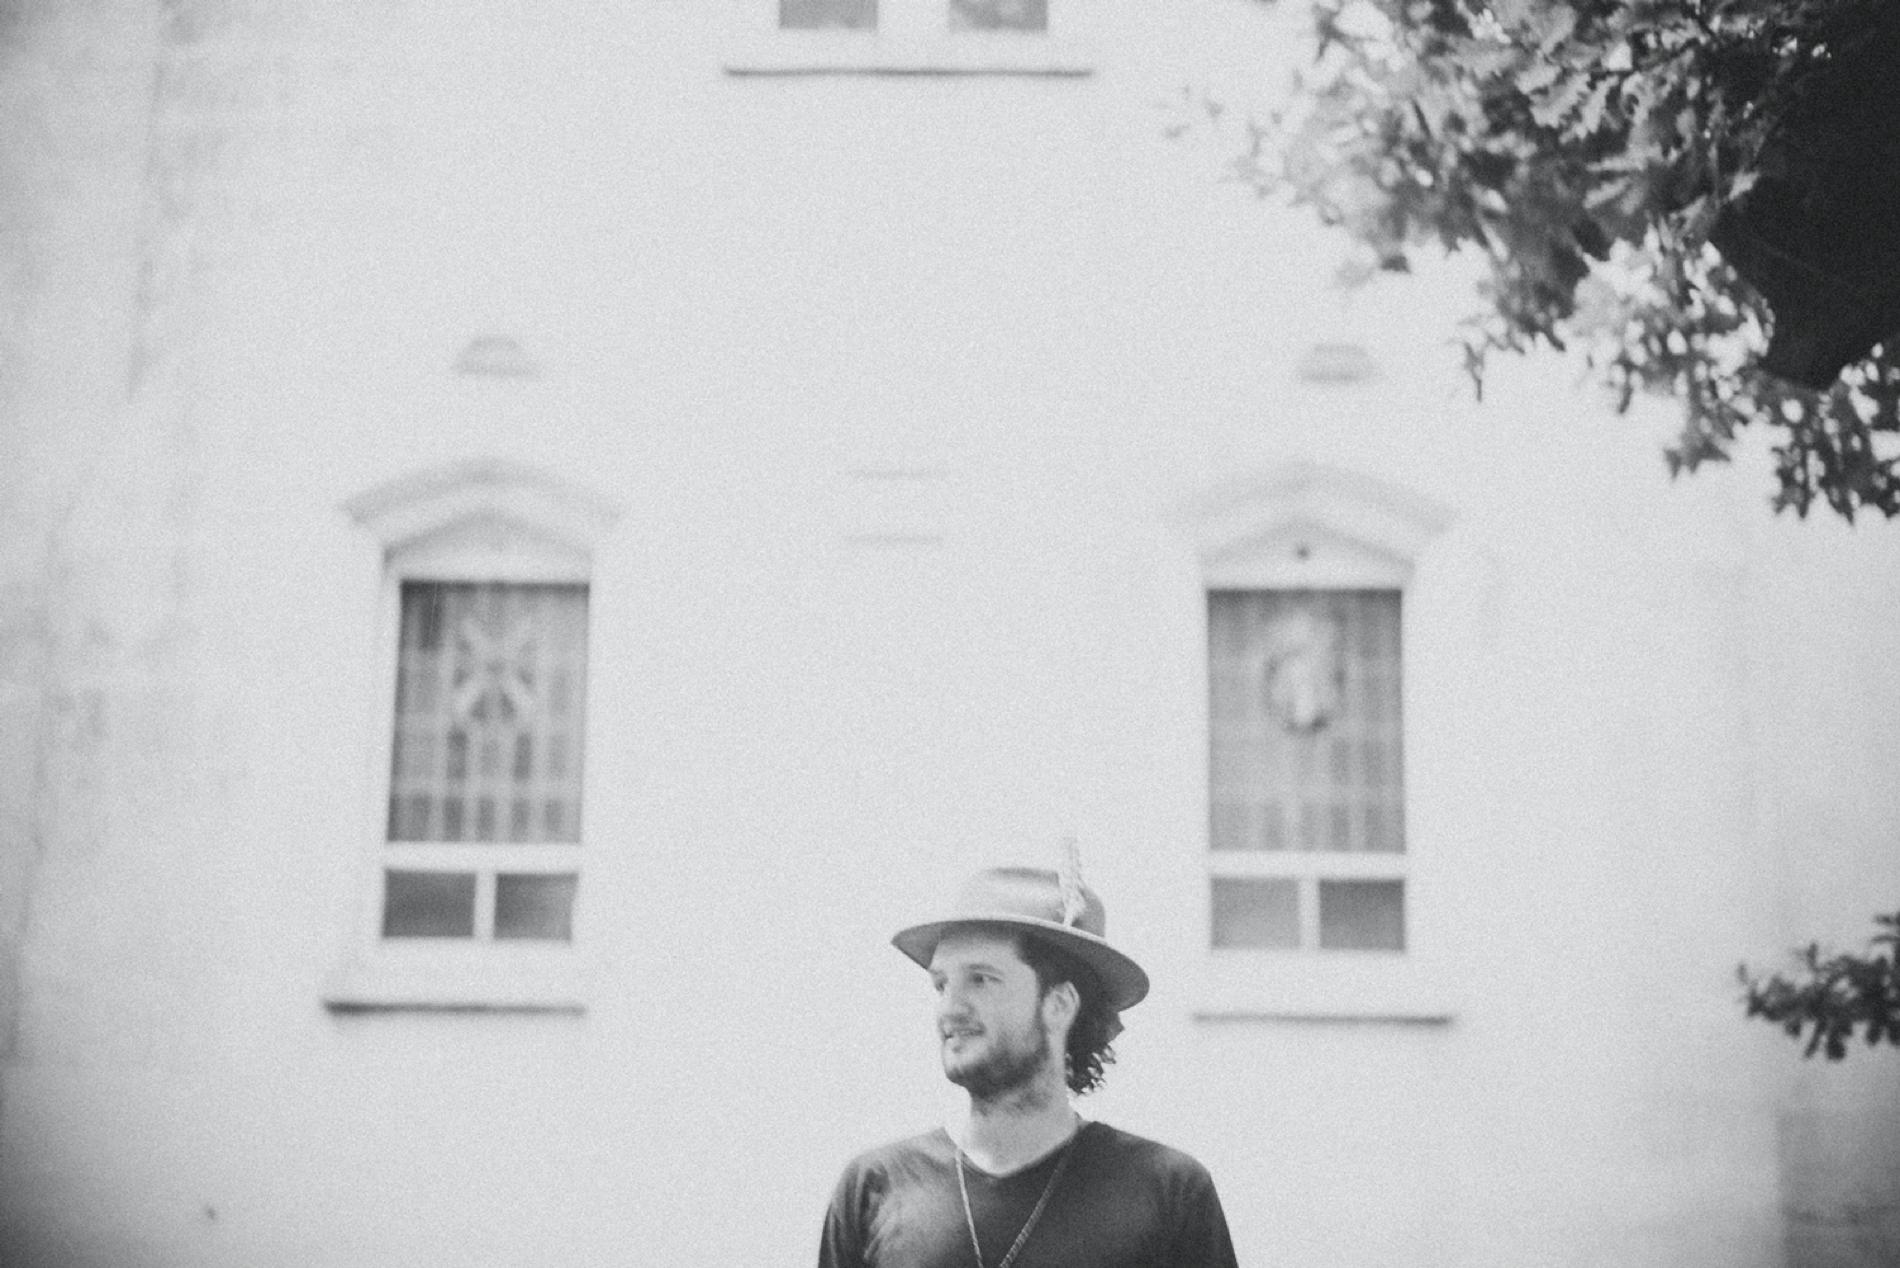 engagement-photographer-kyle-larson